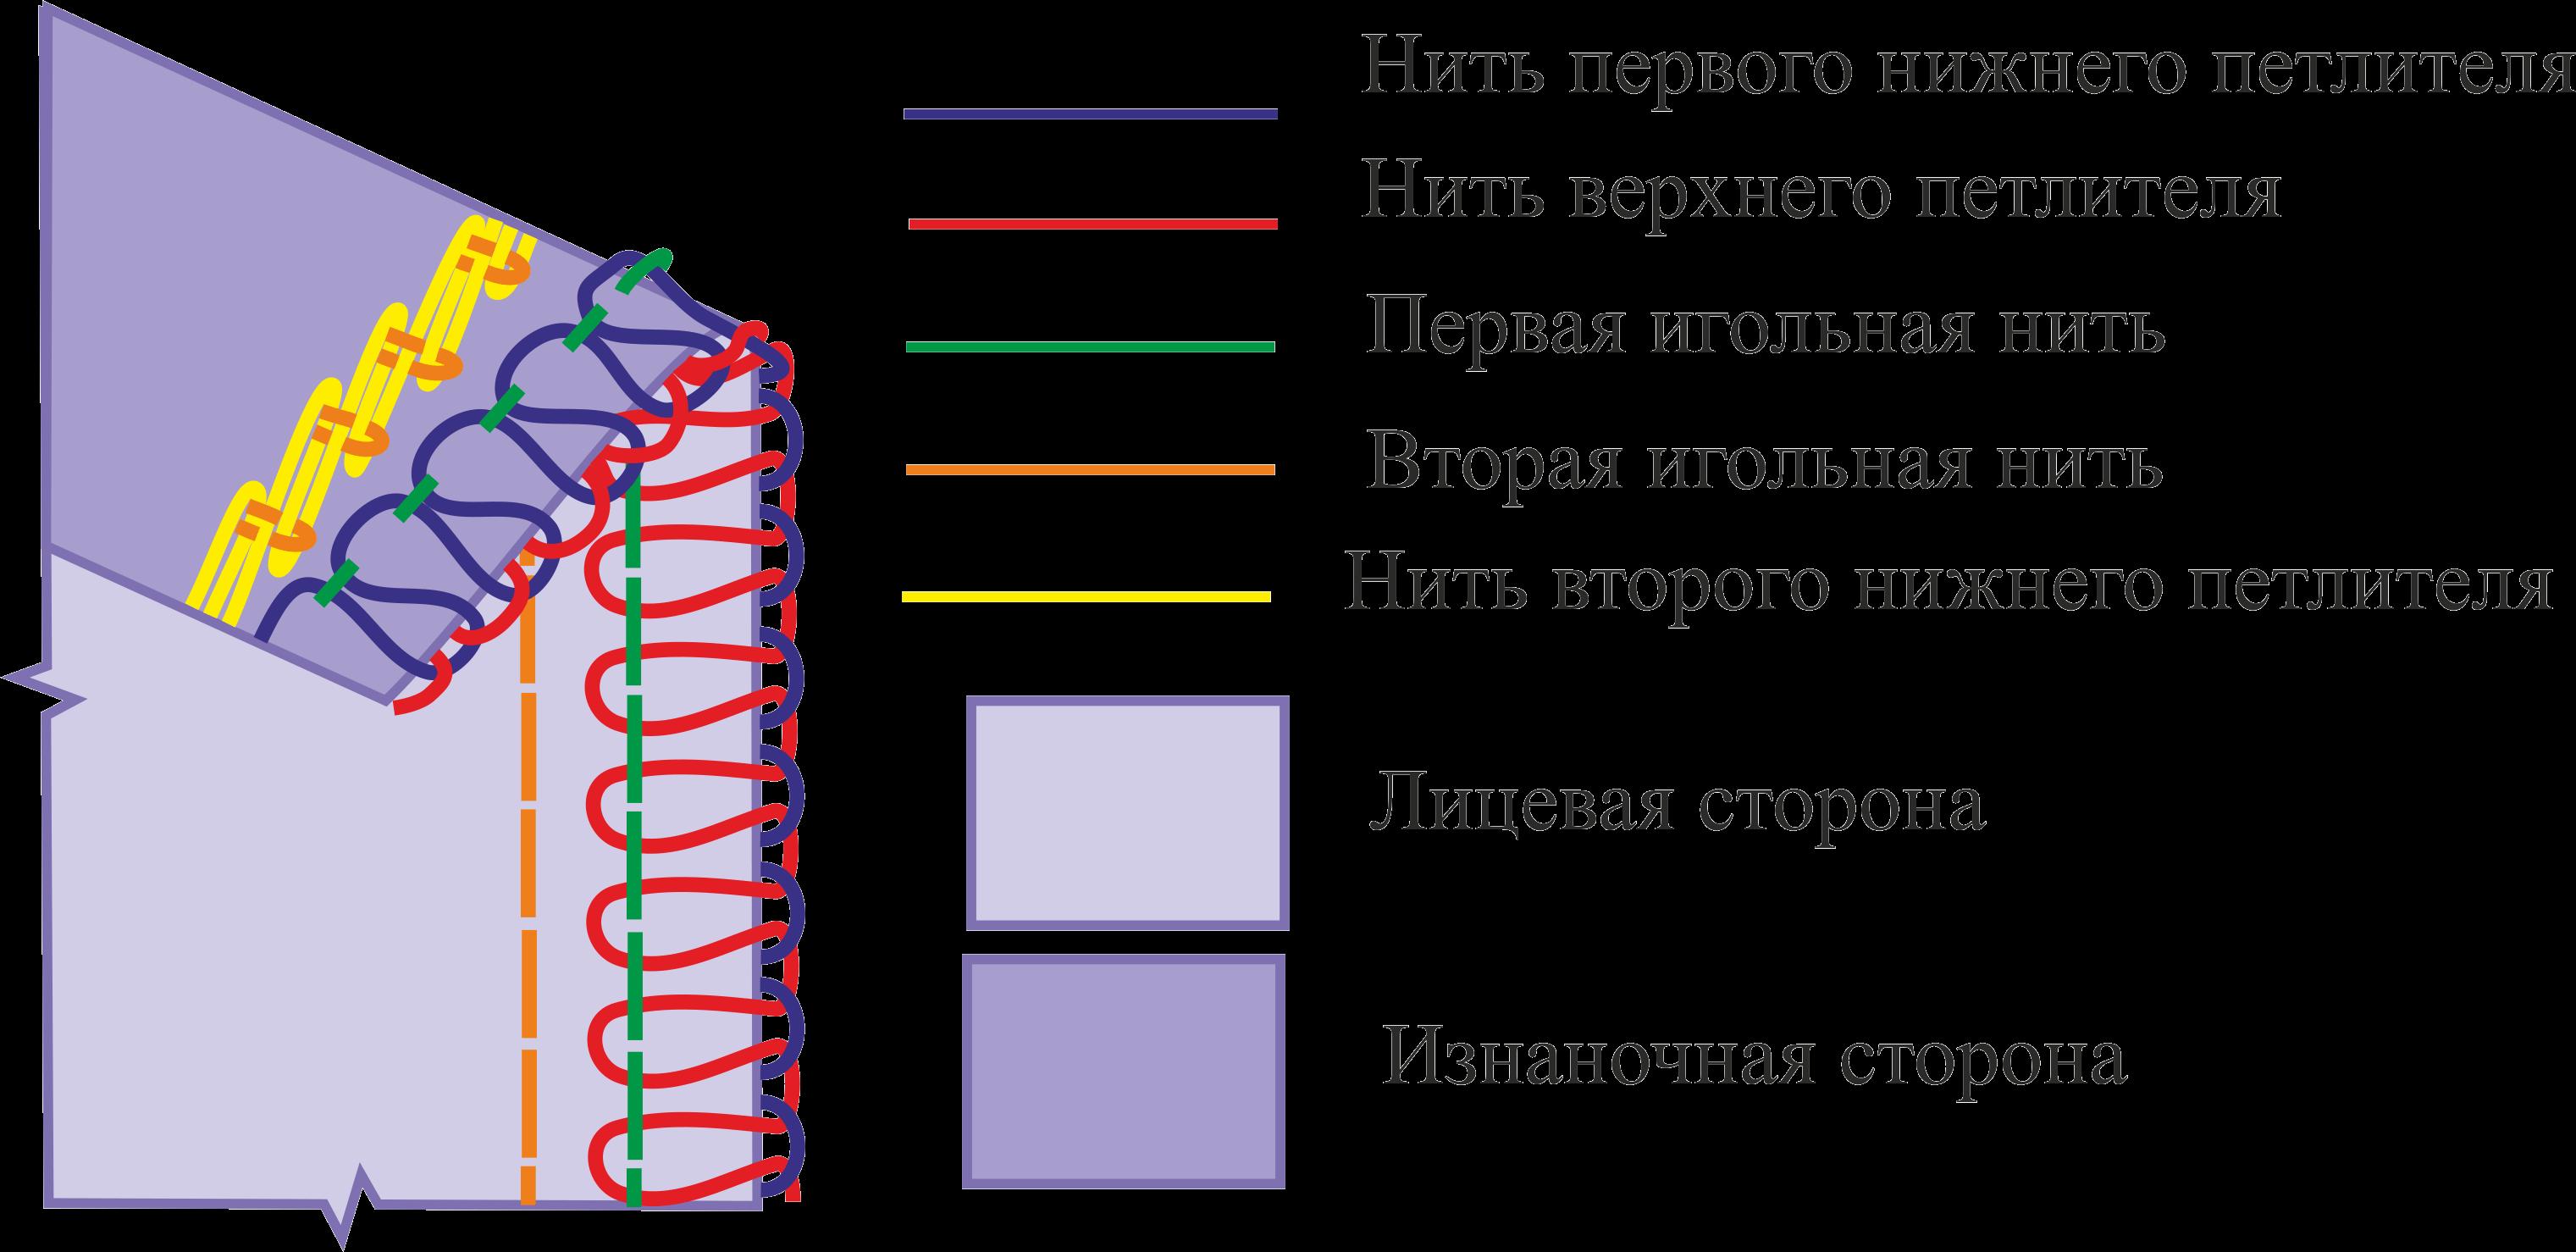 заправка оверлока typical gn794